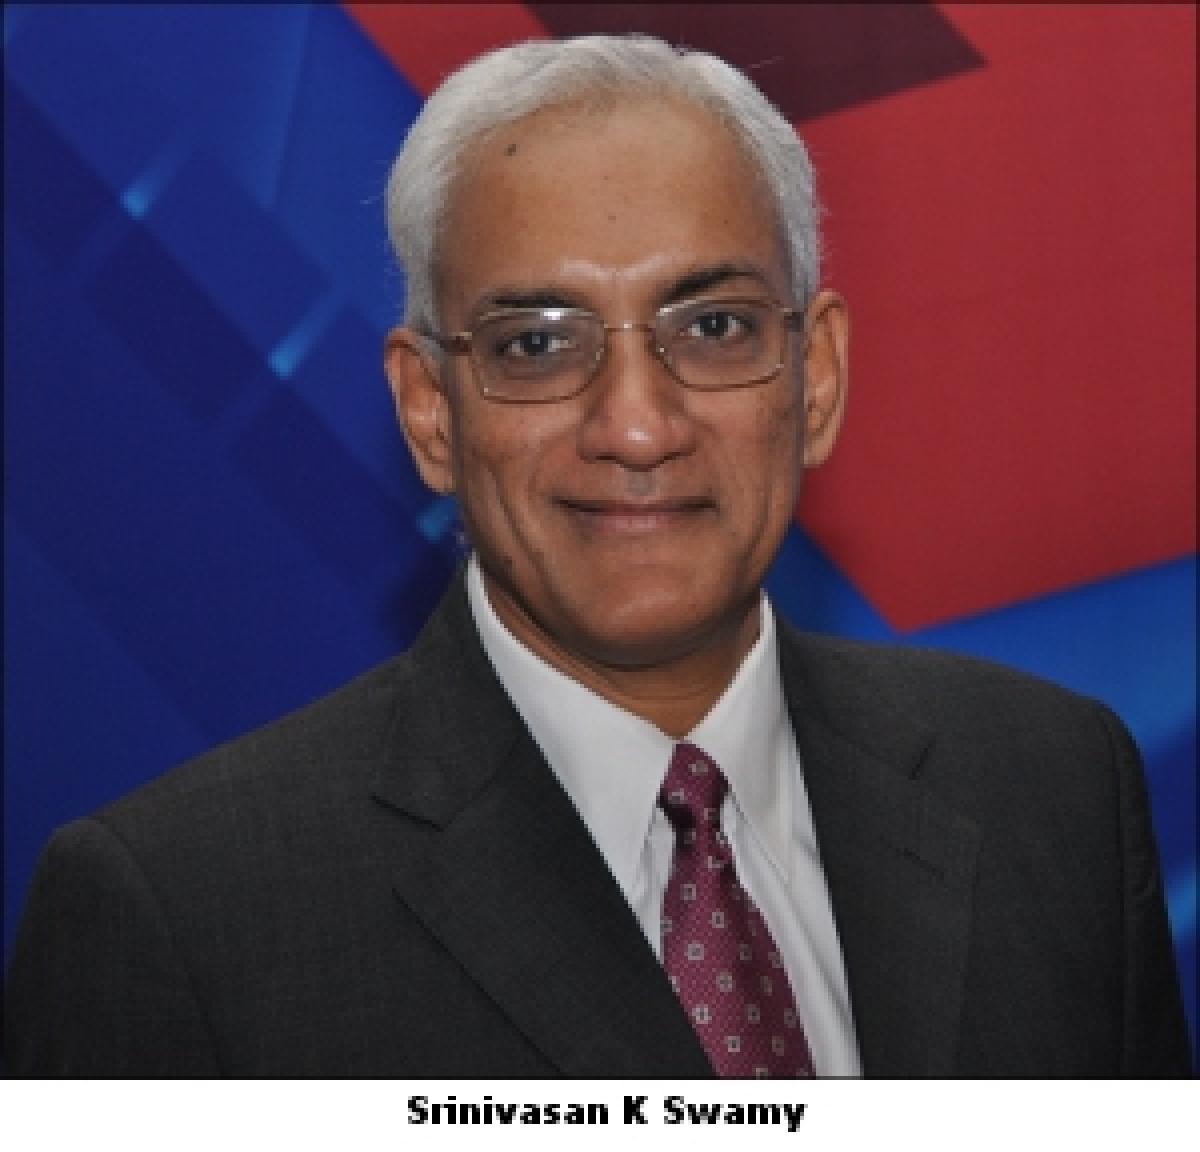 Srinivasan K Swamy to be conferred with AAAI Lifetime Achievement Award 2016